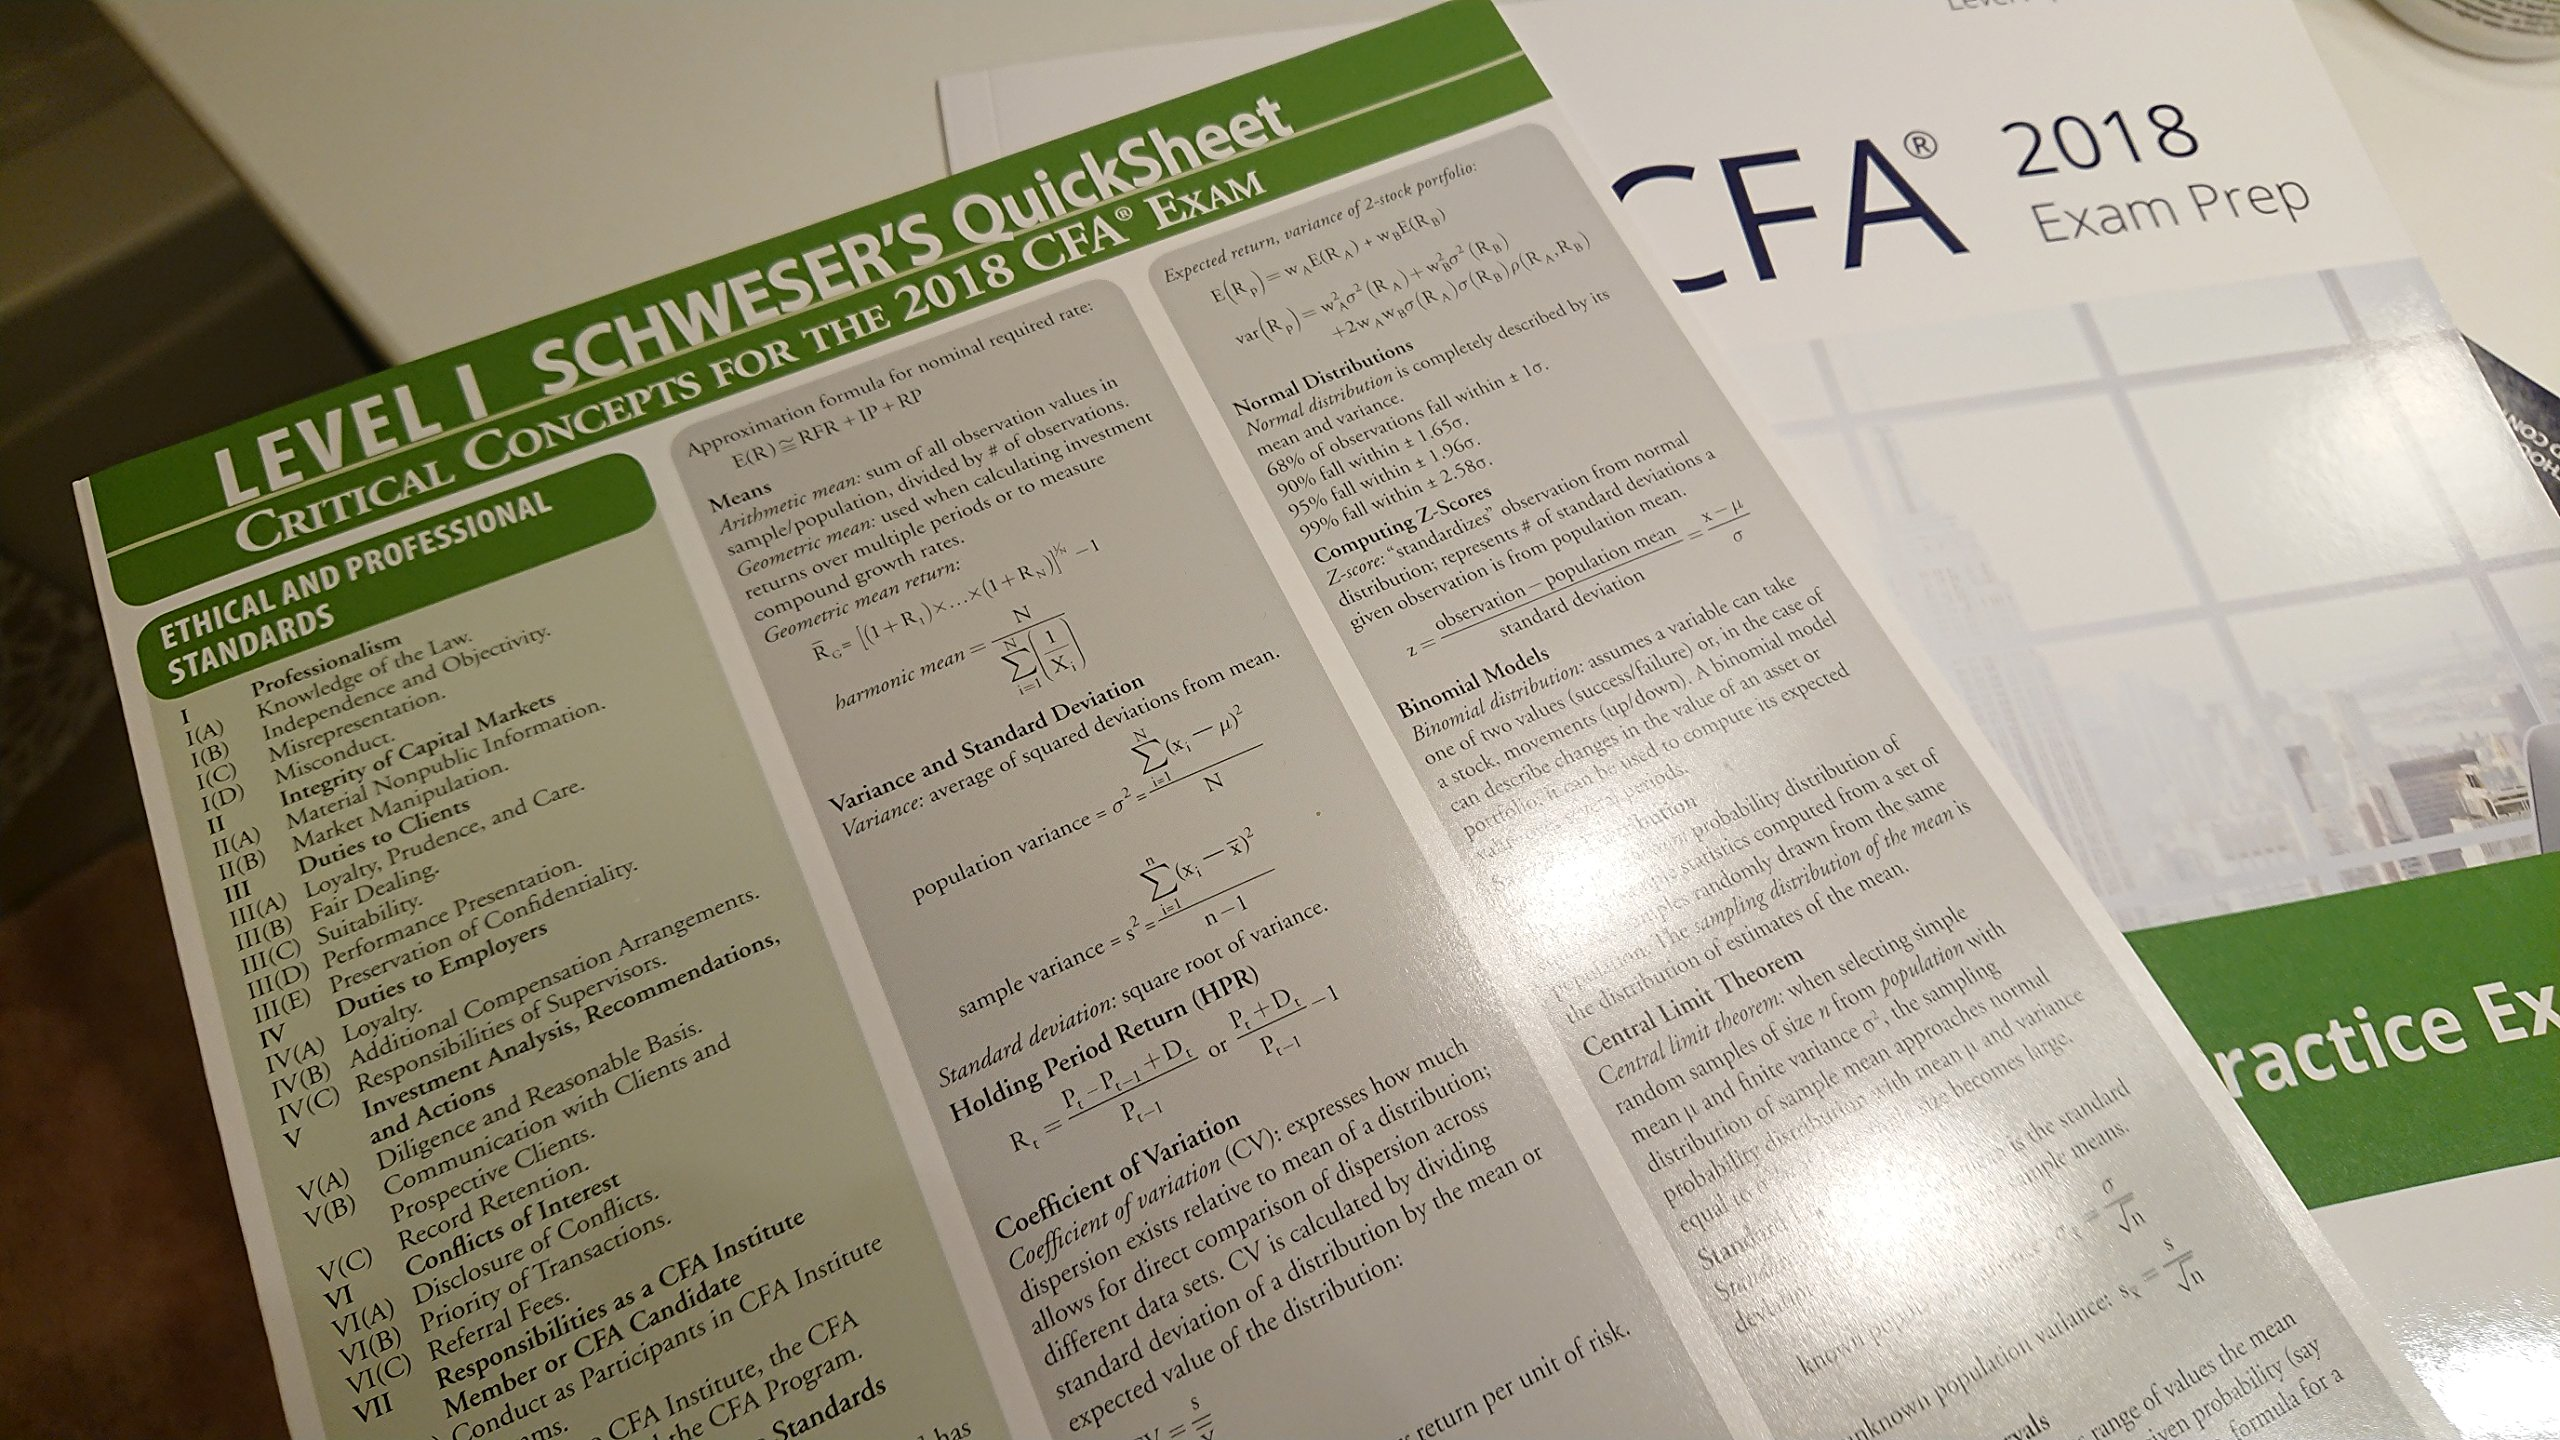 2018 CFA Level 1 Kaplan Schweser: Books 1-5, Practice Exam